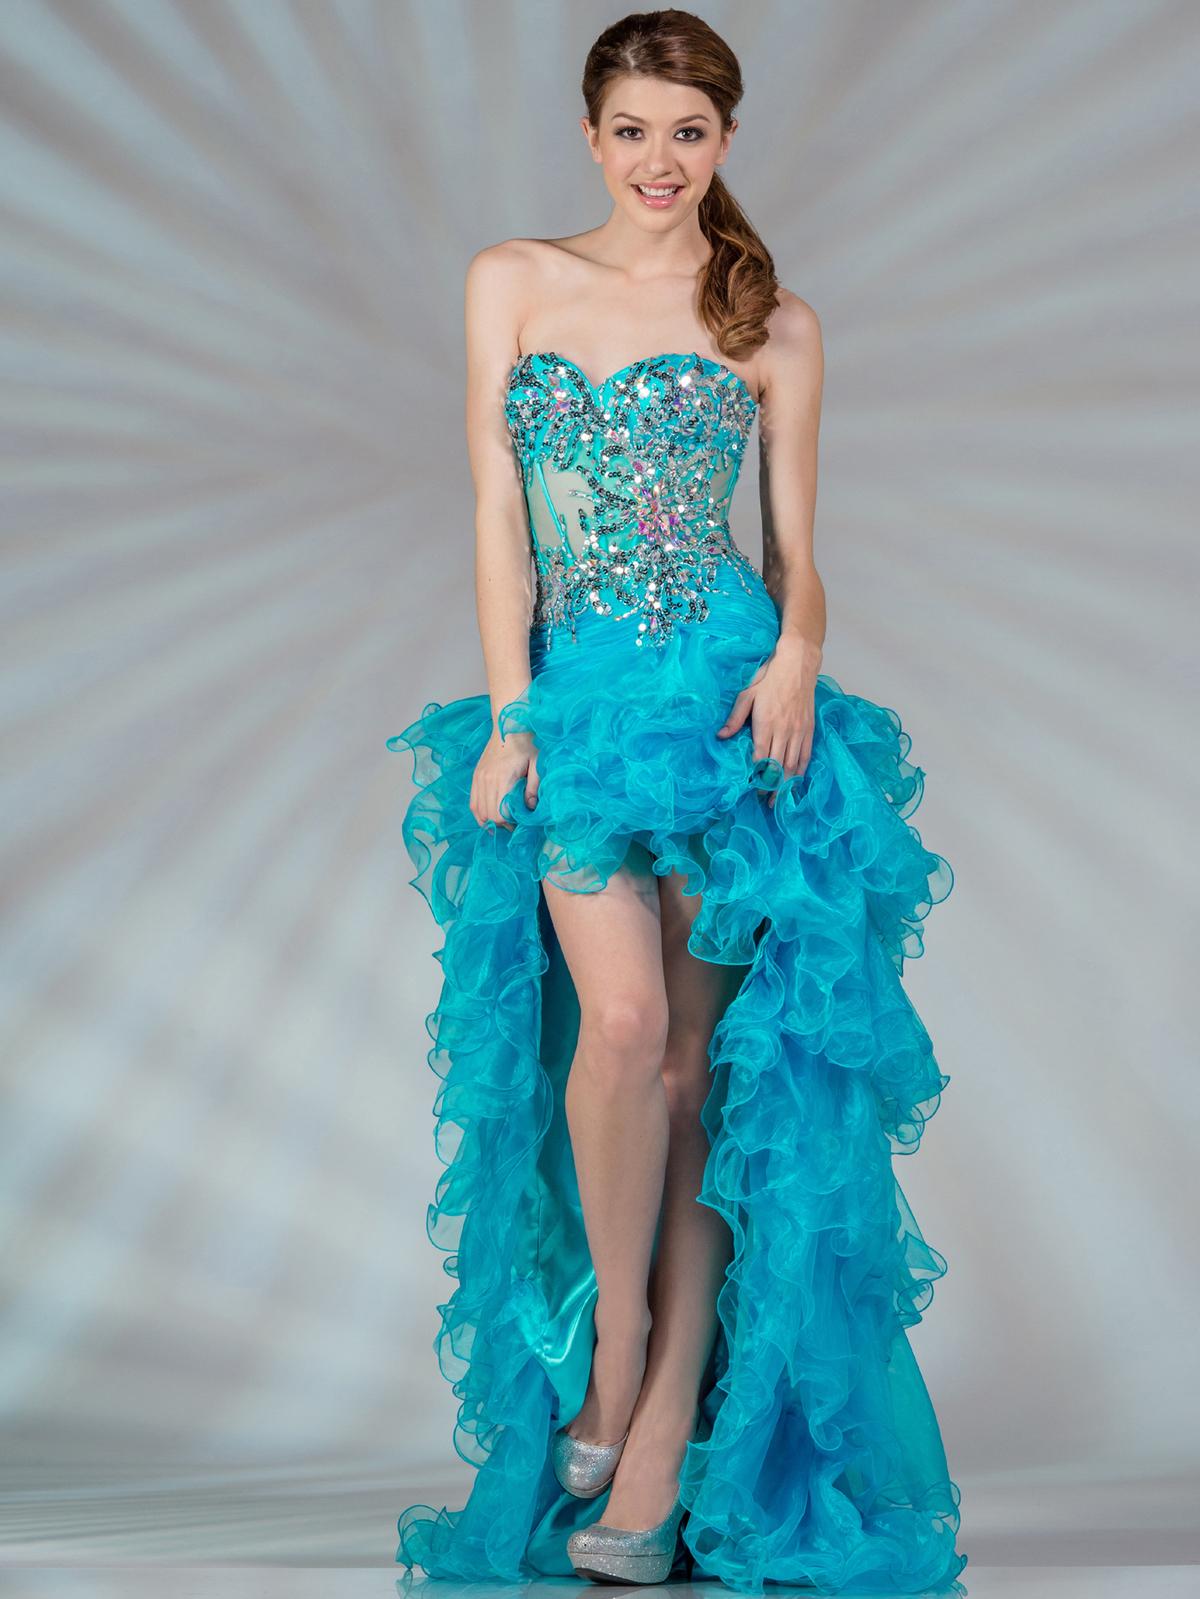 Sheer Corset High Low Dress Sung Boutique L A